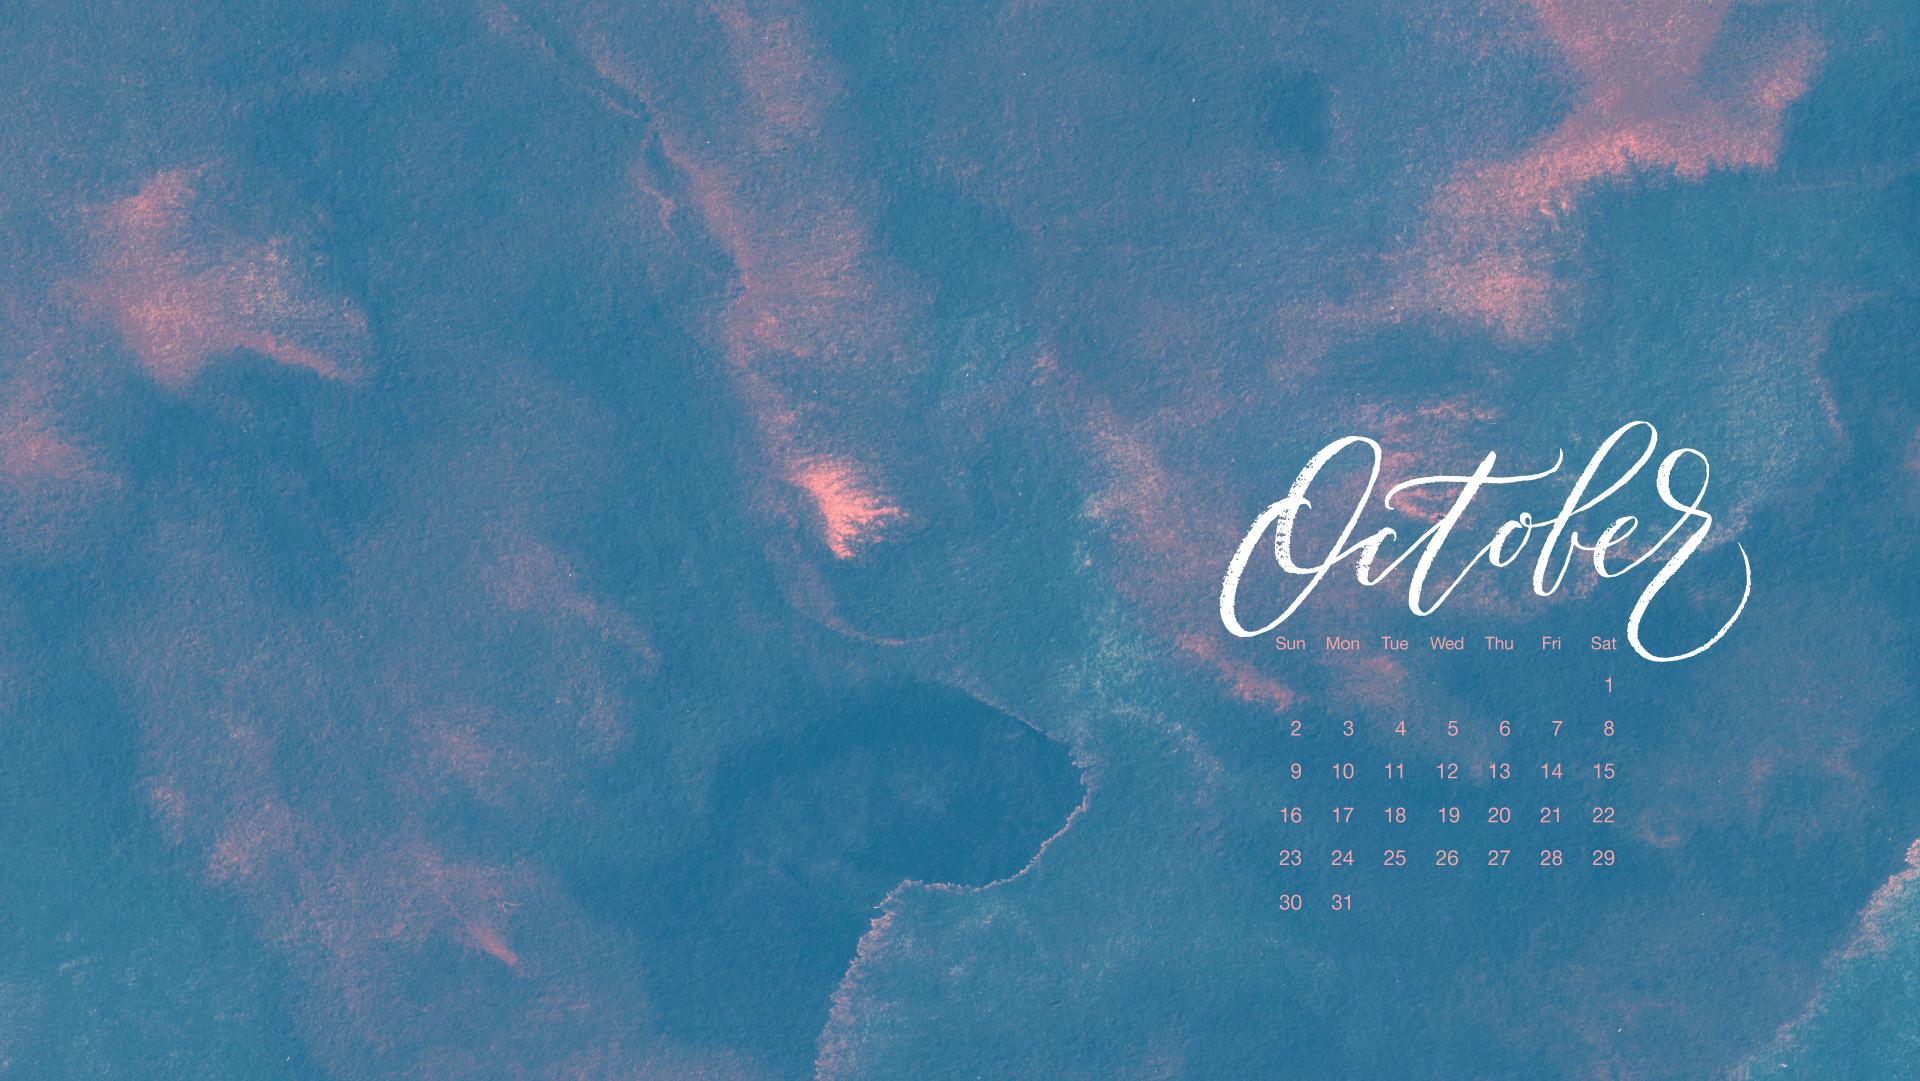 Free Desktop Calendar for October 2016   typeandgraphicslab.com